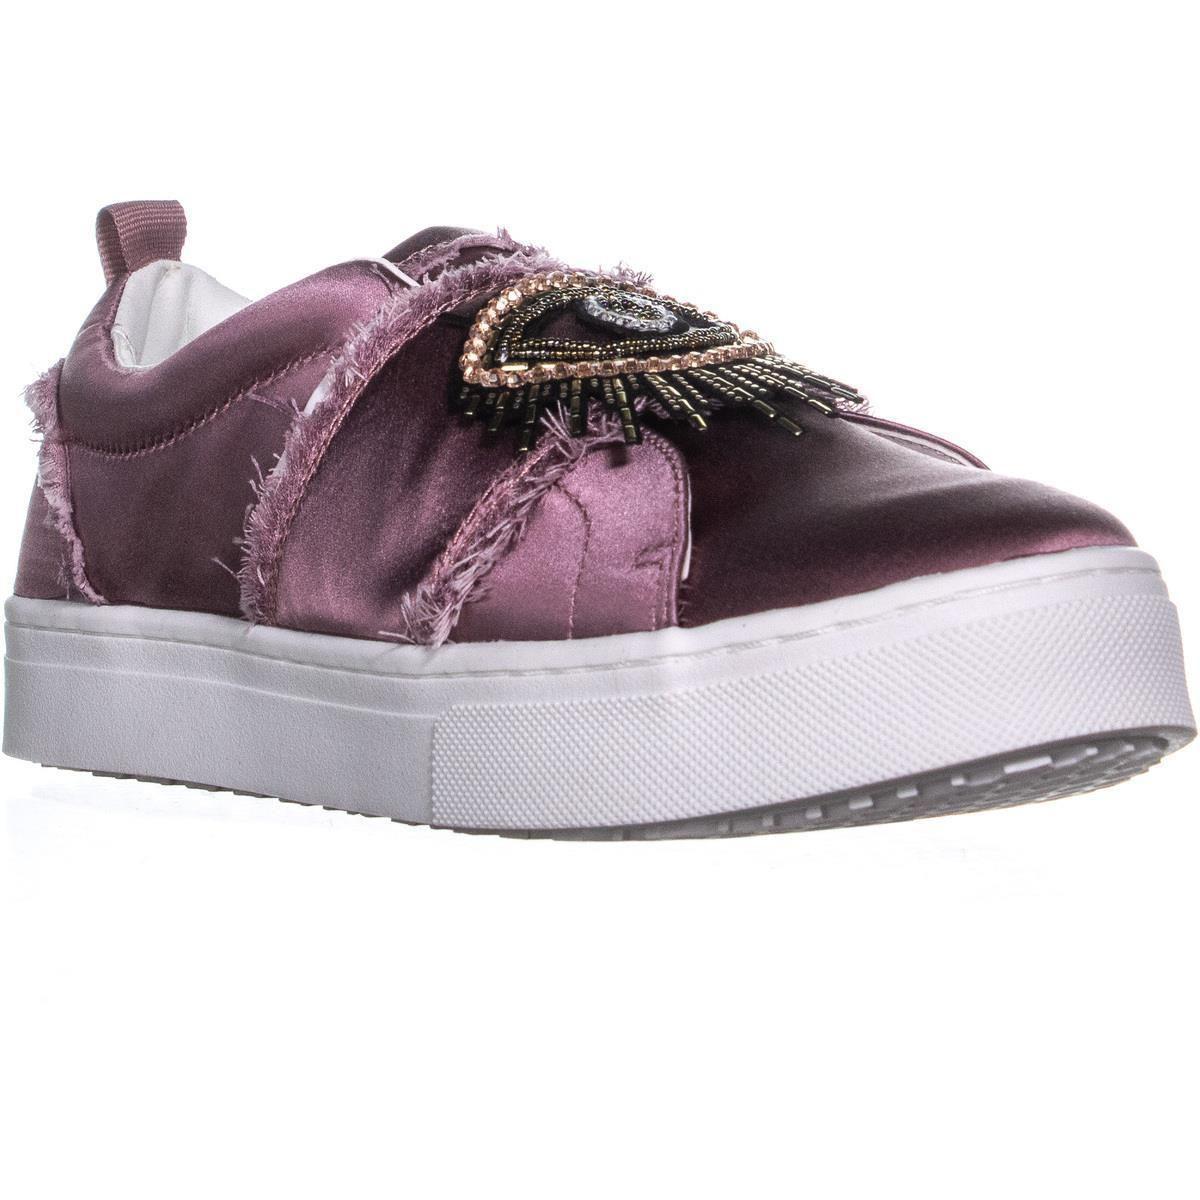 045f77f617e8 Sam Edelman. Women s Levine Low Top Platform Sneakers ...